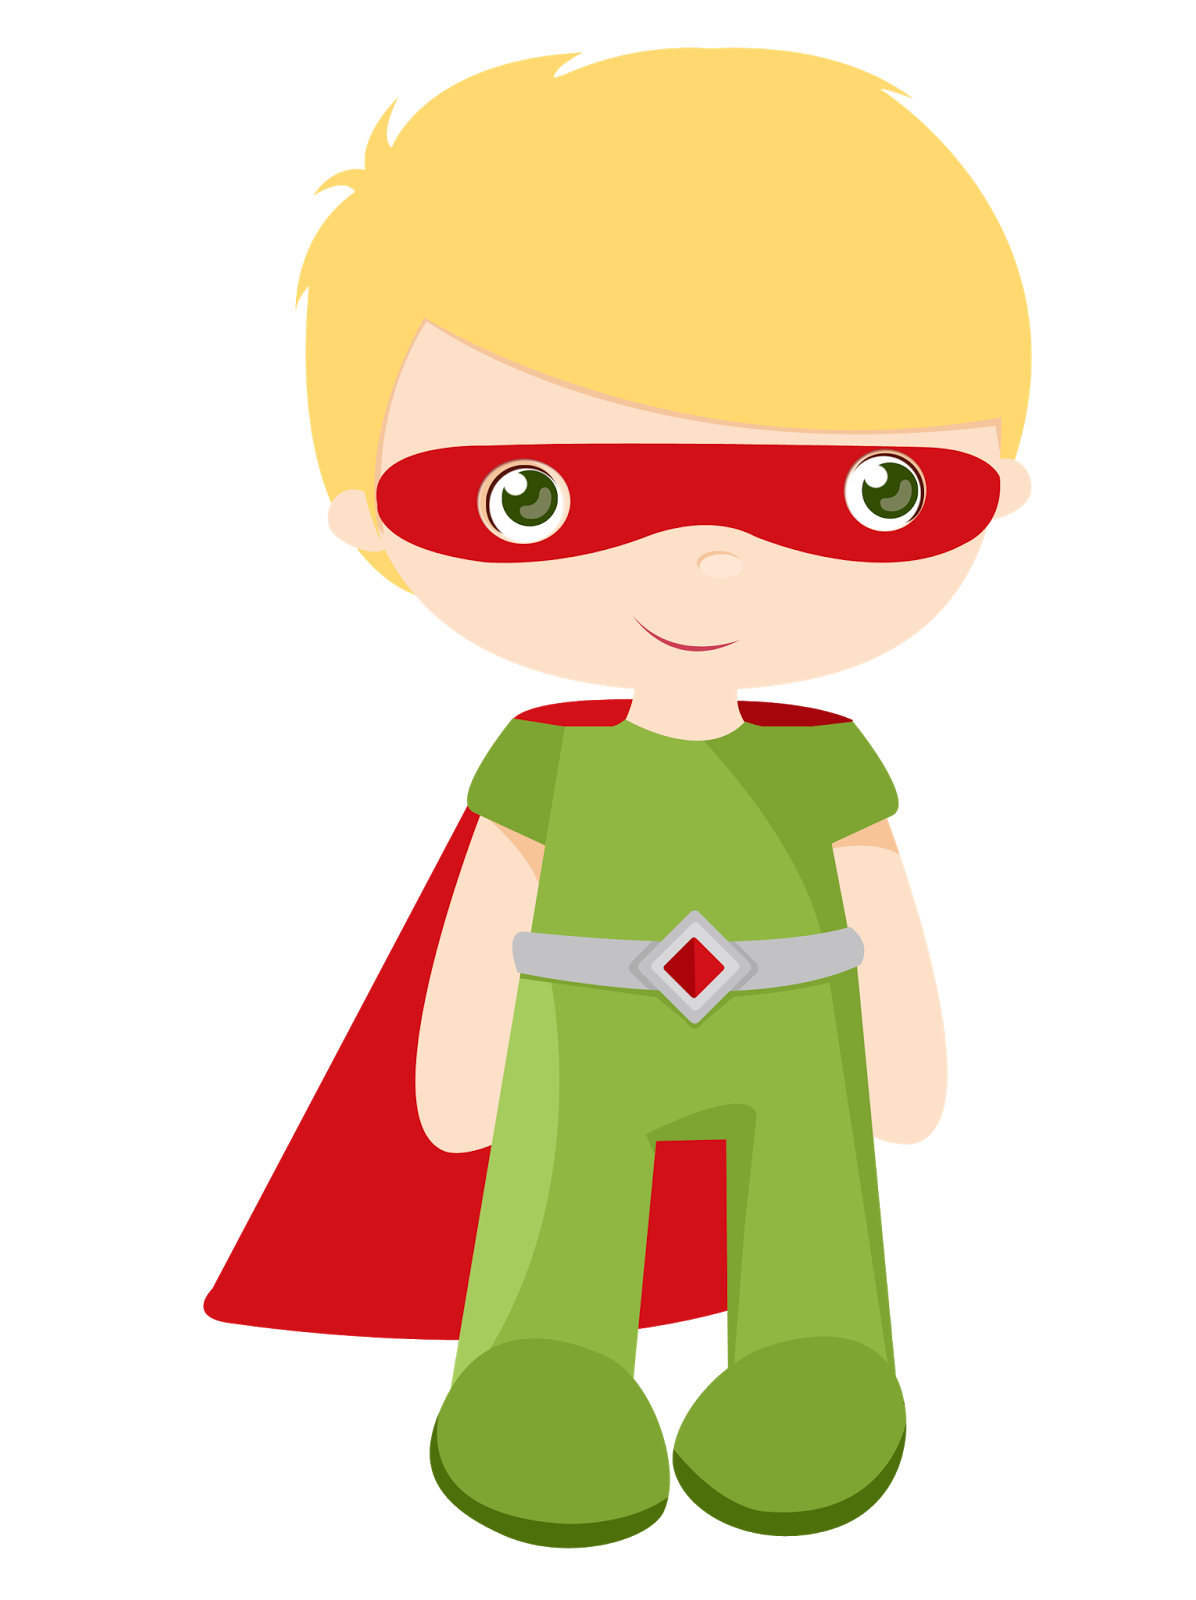 clip art download Mothers clipart superhero. Kids dressed as superheroes.